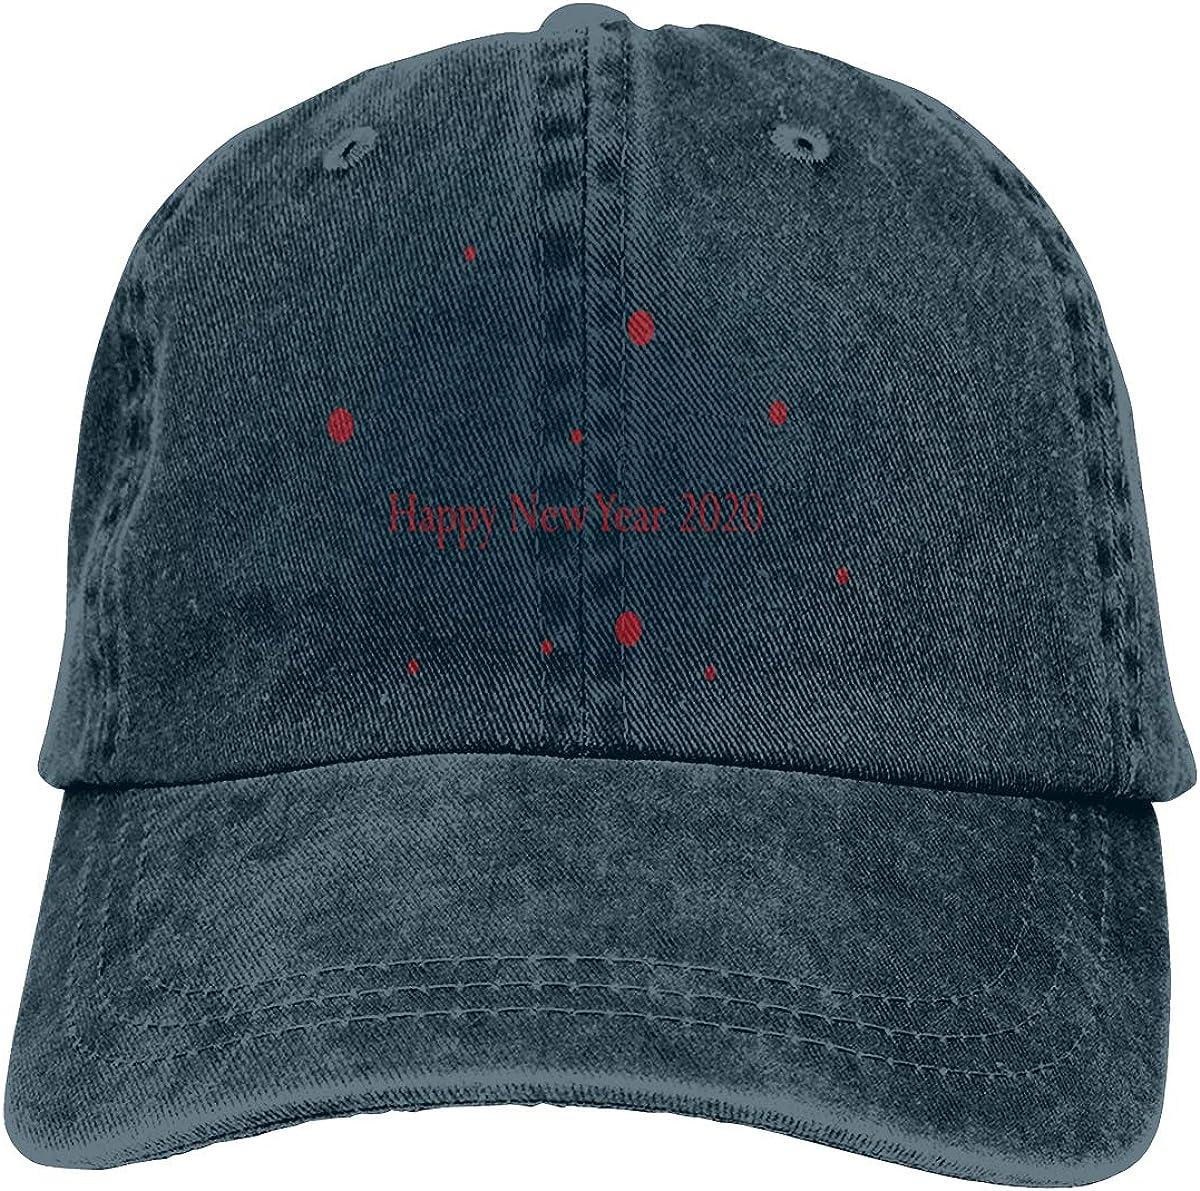 GAOFEIhat New Year Unisex Adult Denim Hats Cowboy Hat Dad Hat Driver Cap